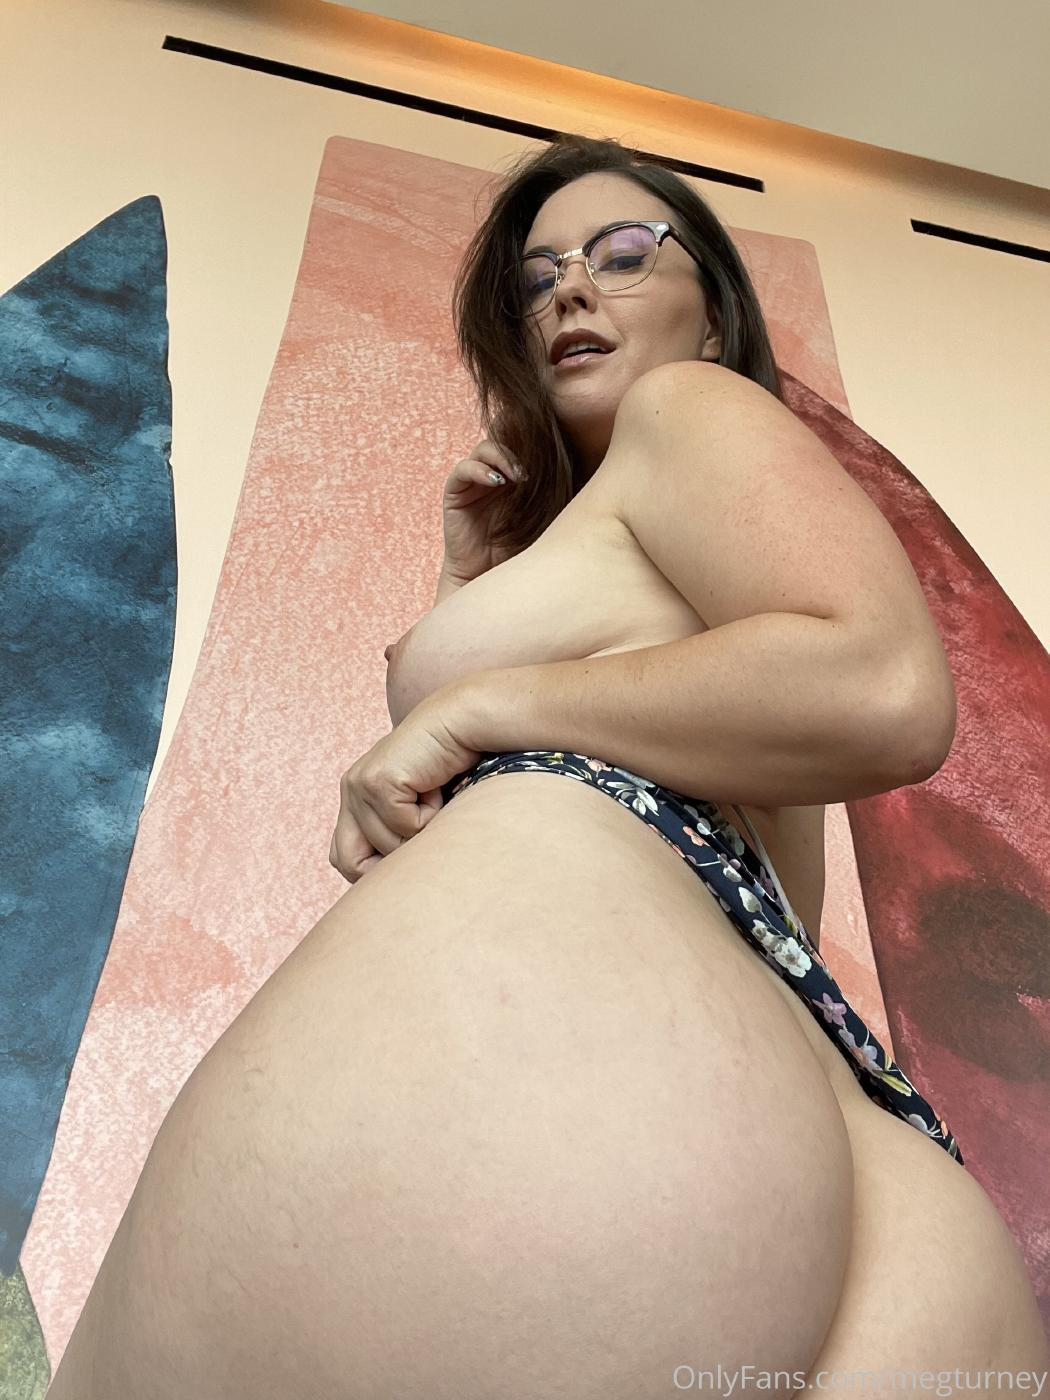 Meg Turney Unshaven Pussy Candids Onlyfans Set Leaked Rlnqnk